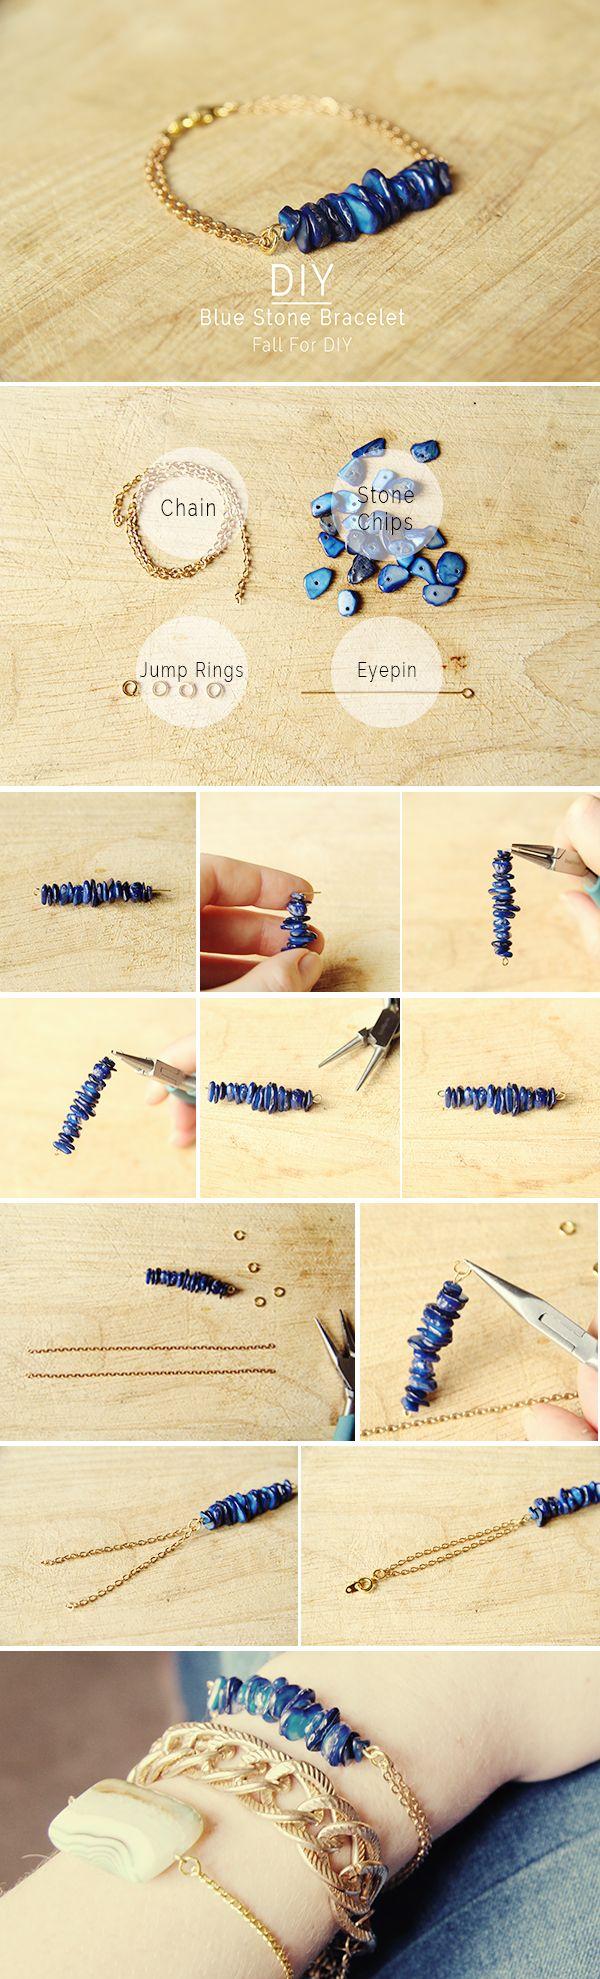 Cute bracelet diy